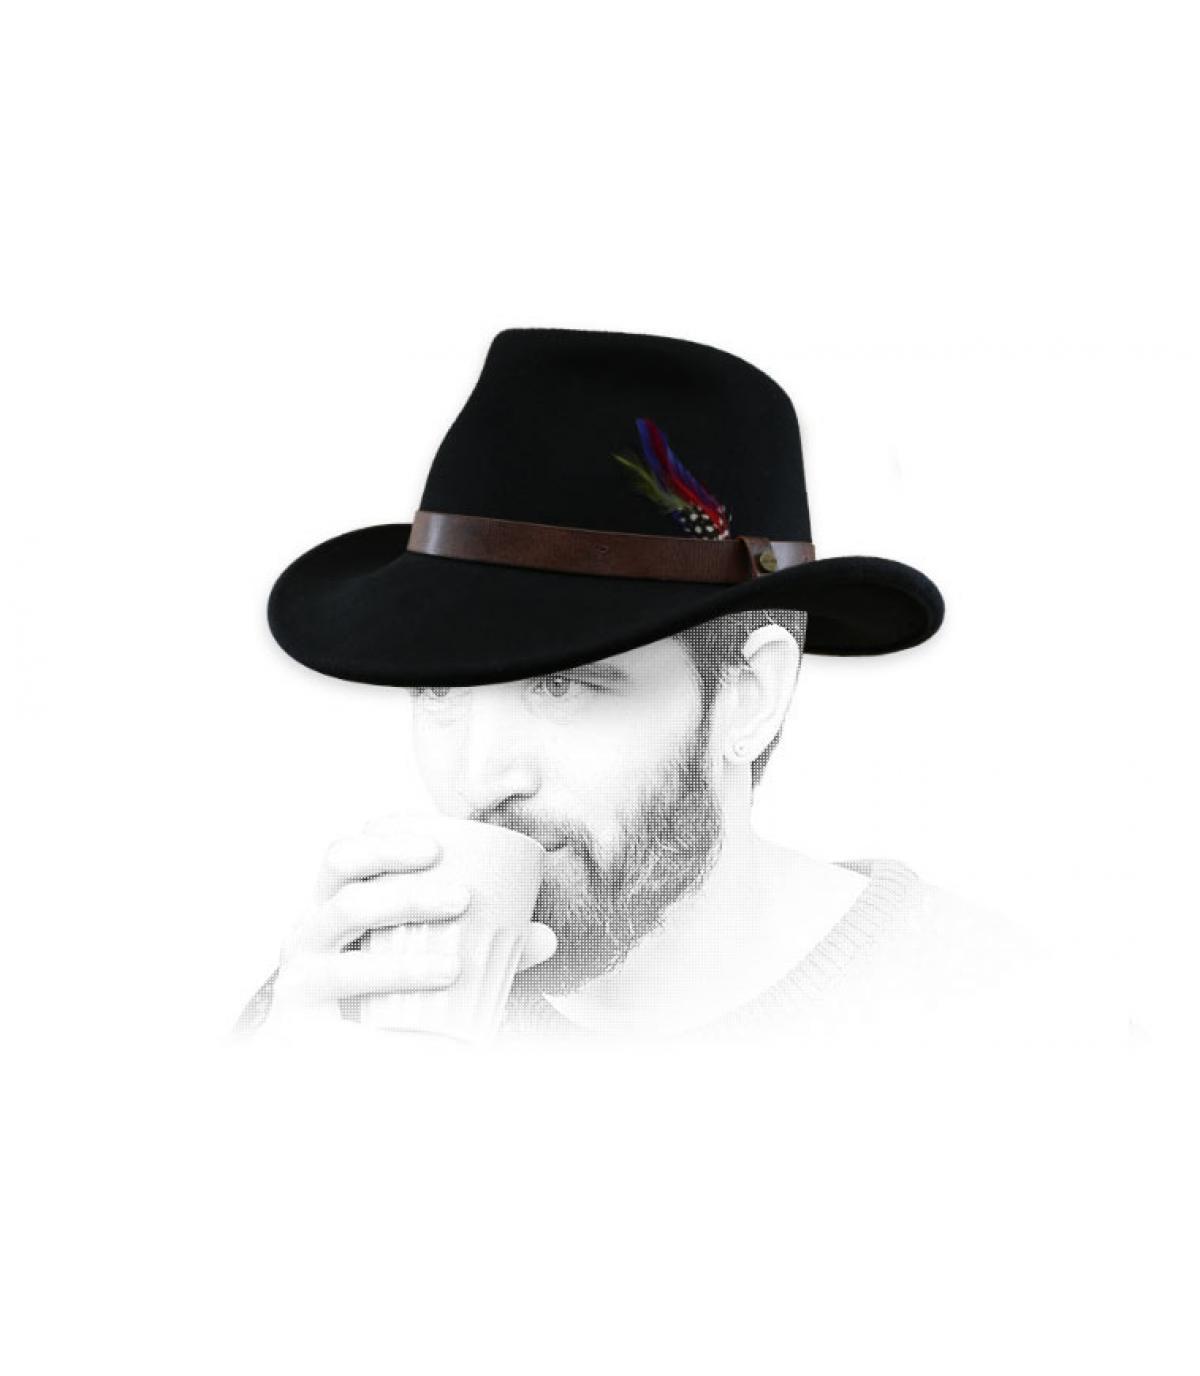 Cowboy Filzhut schwarz